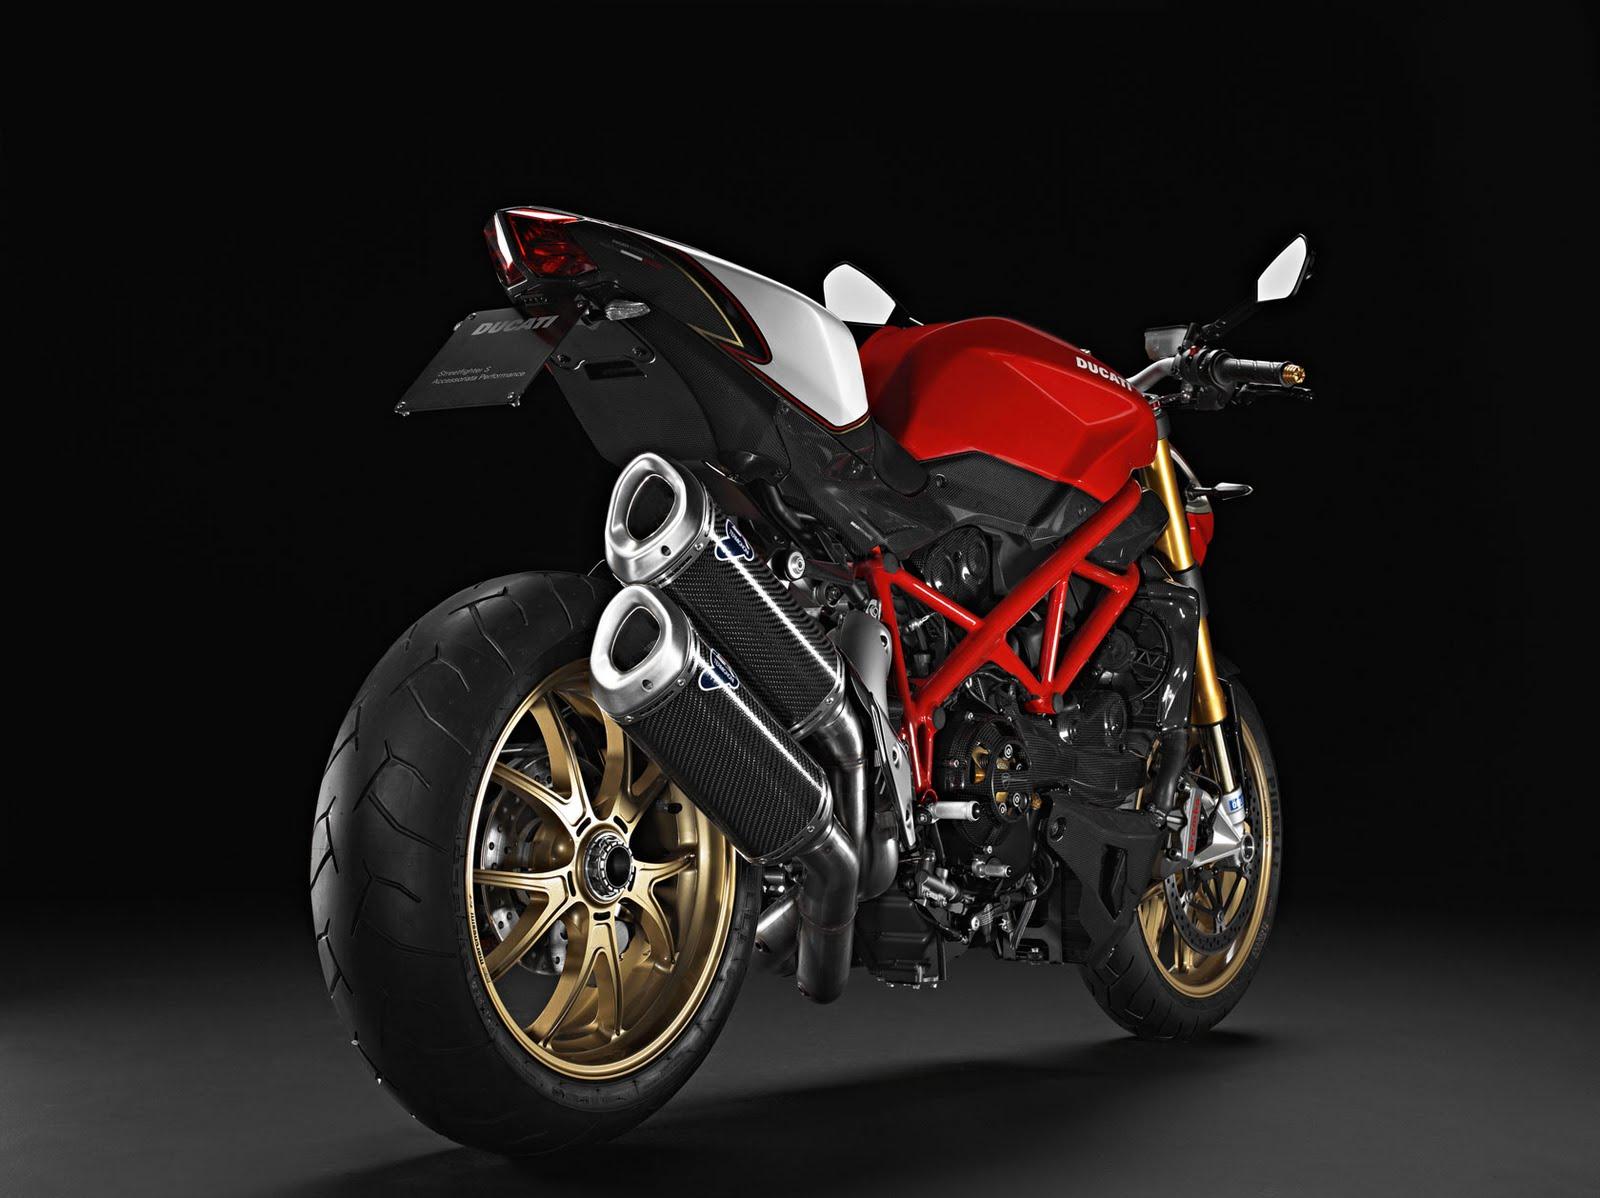 2015 Ducati Streetfighter